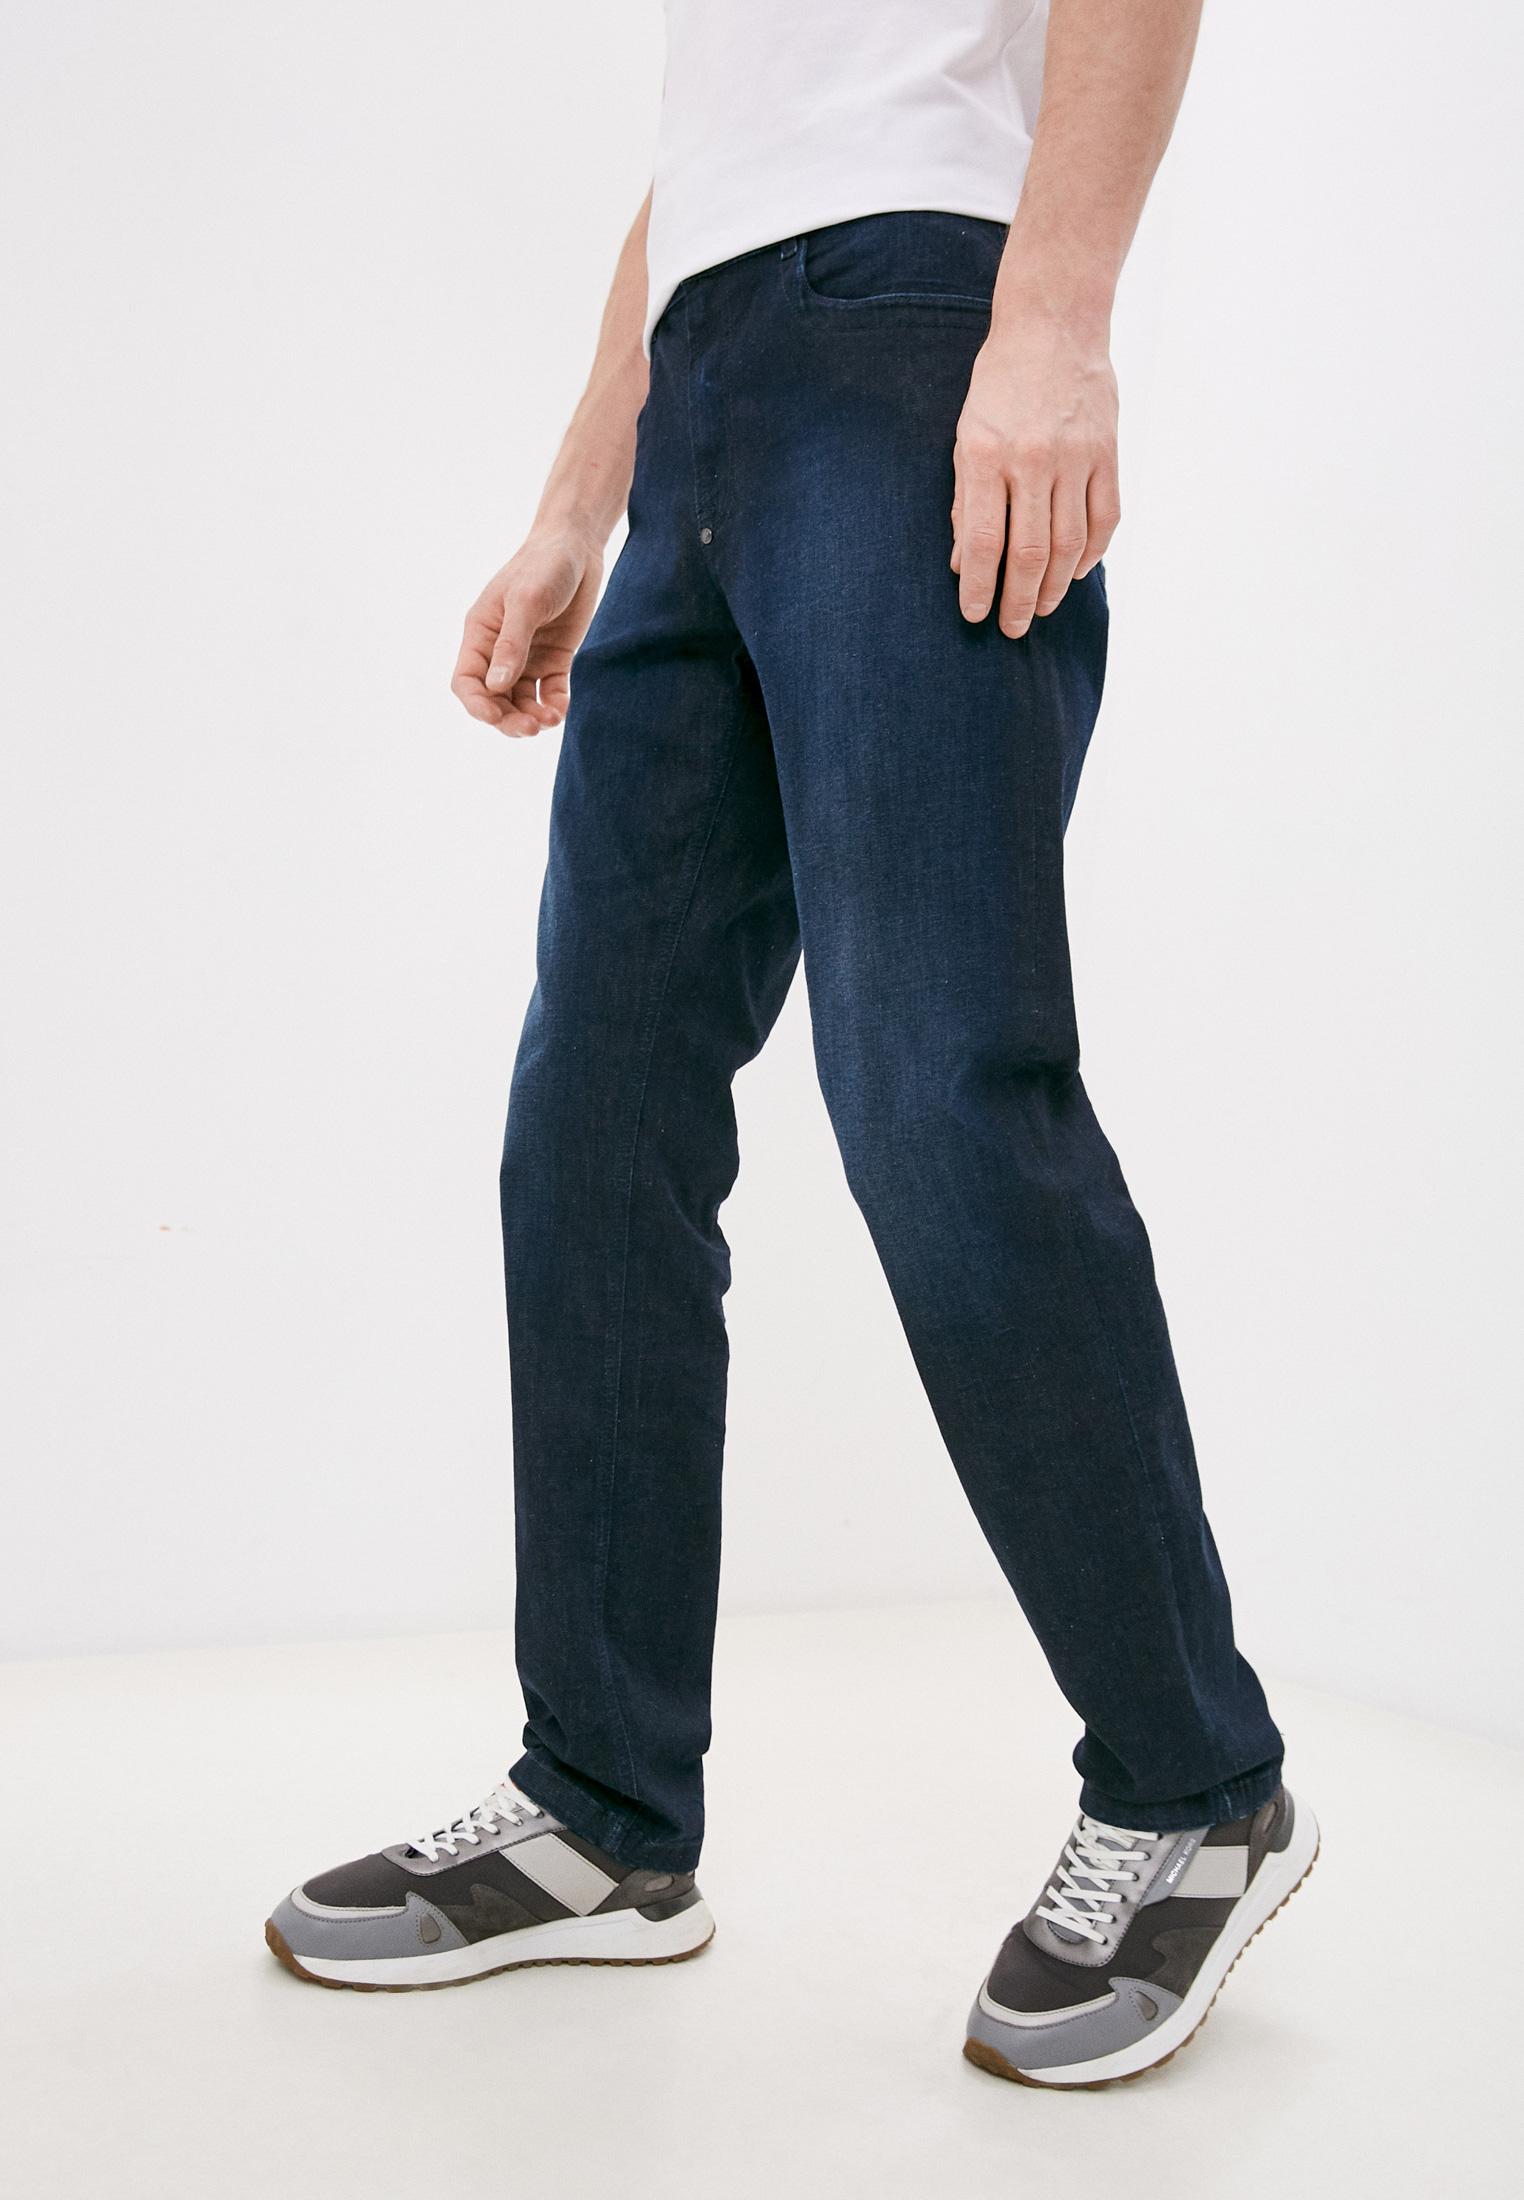 Мужские прямые джинсы Bikkembergs (Биккембергс) C Q 102 22 S 3511